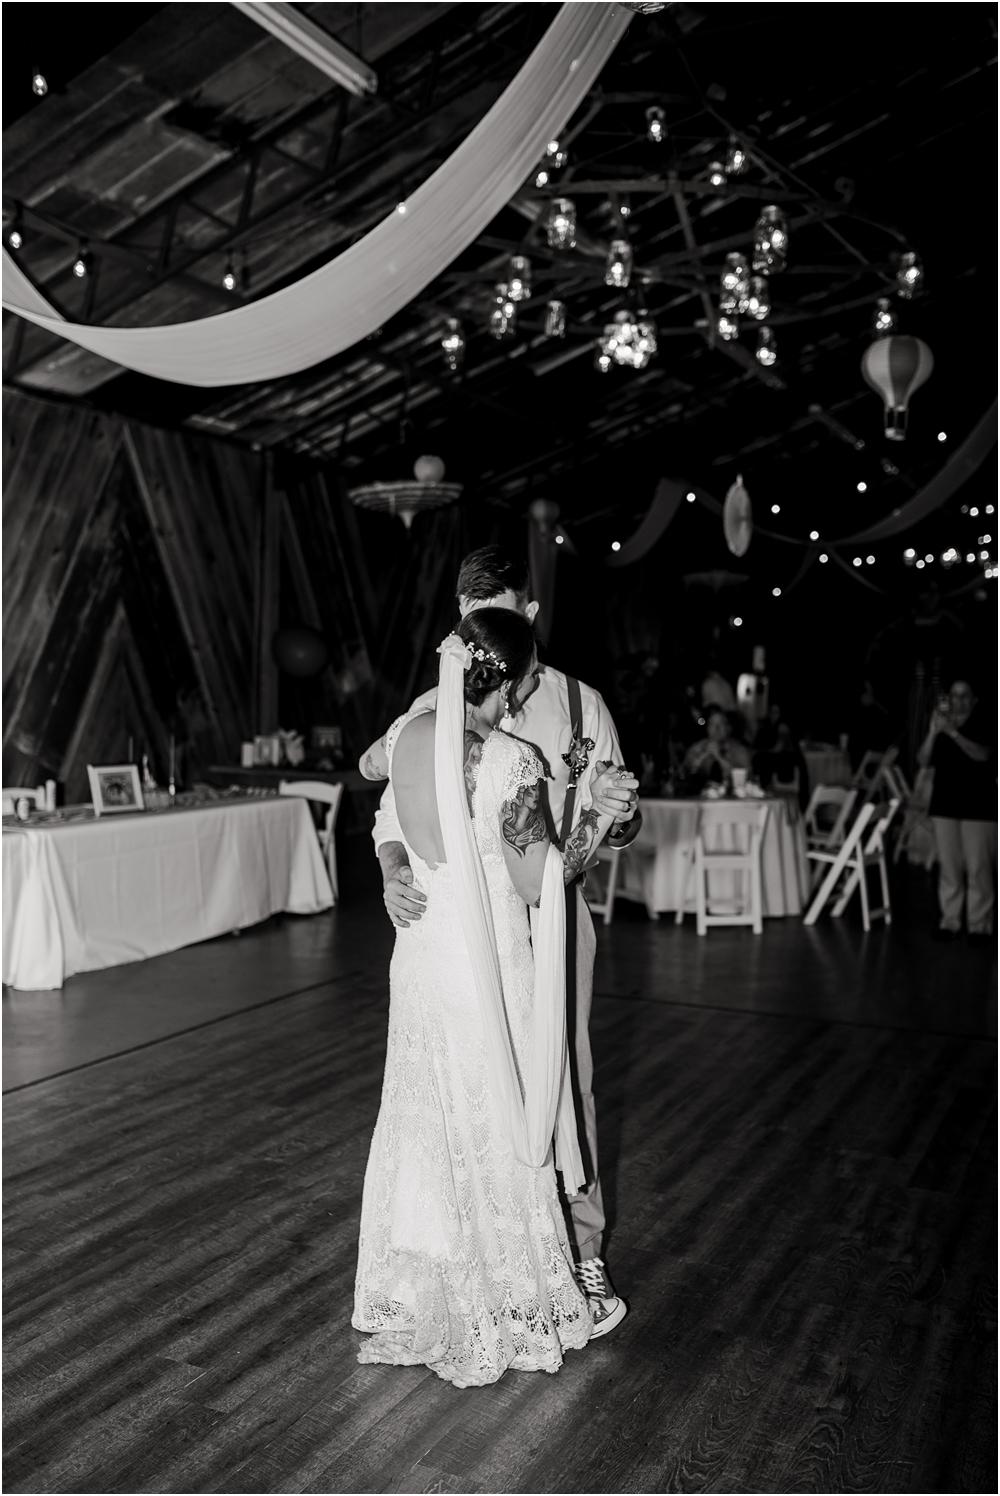 the-barn-at-wateroaks-circus-florida-wedding-photographer-kiersten-stevenson-photography-116.jpg